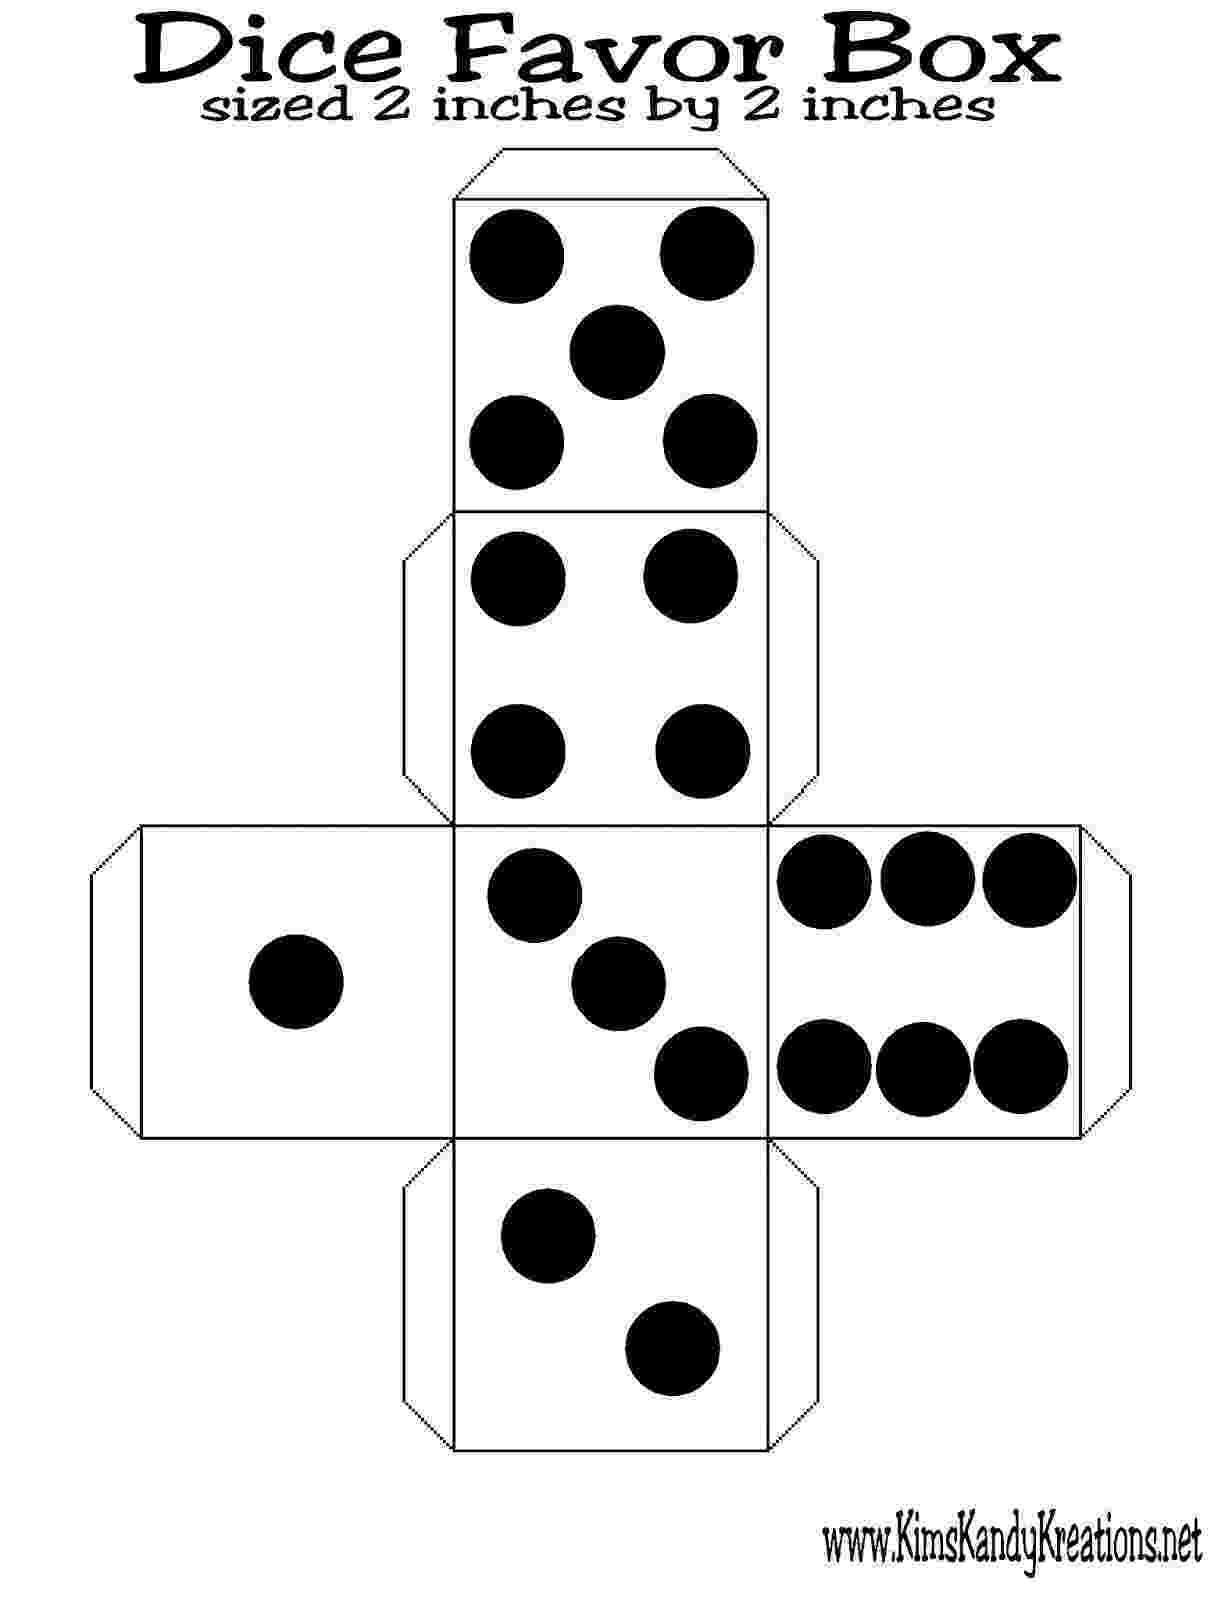 dice print dice template by nicole bennett teachers pay teachers dice print